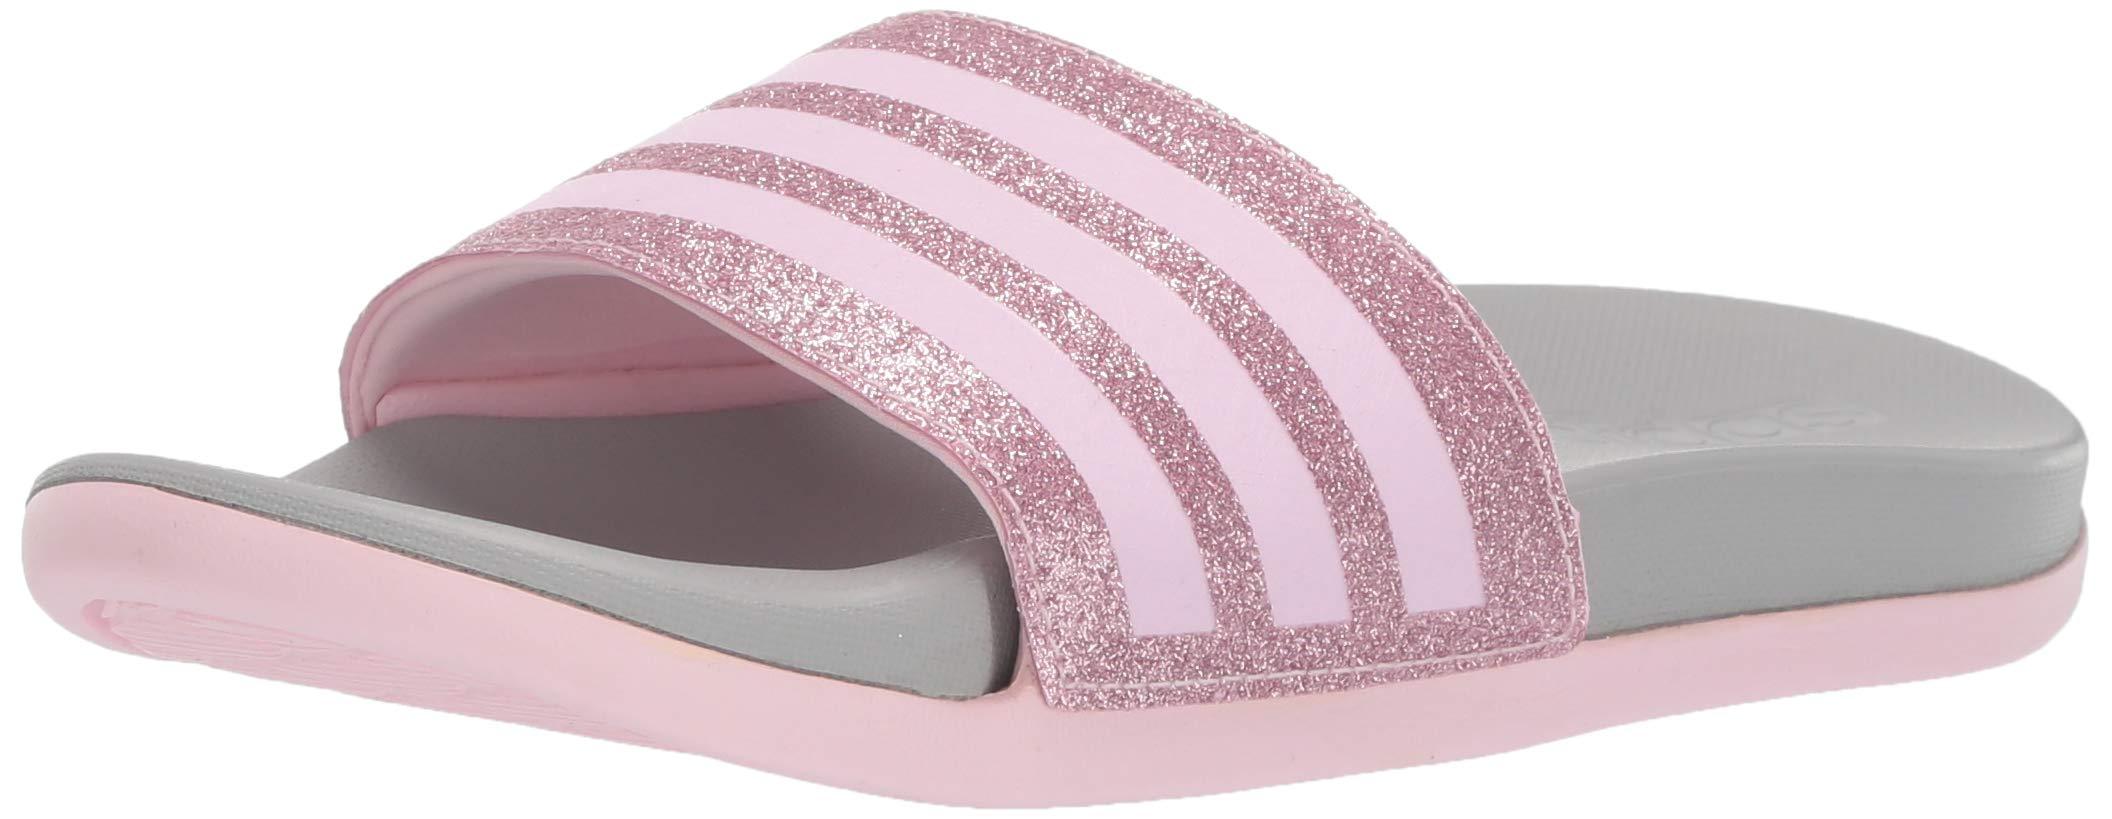 adidas Girl's Adilette Comfort Sandal, Clear Pink/Grey, 10 Medium US Little Kid